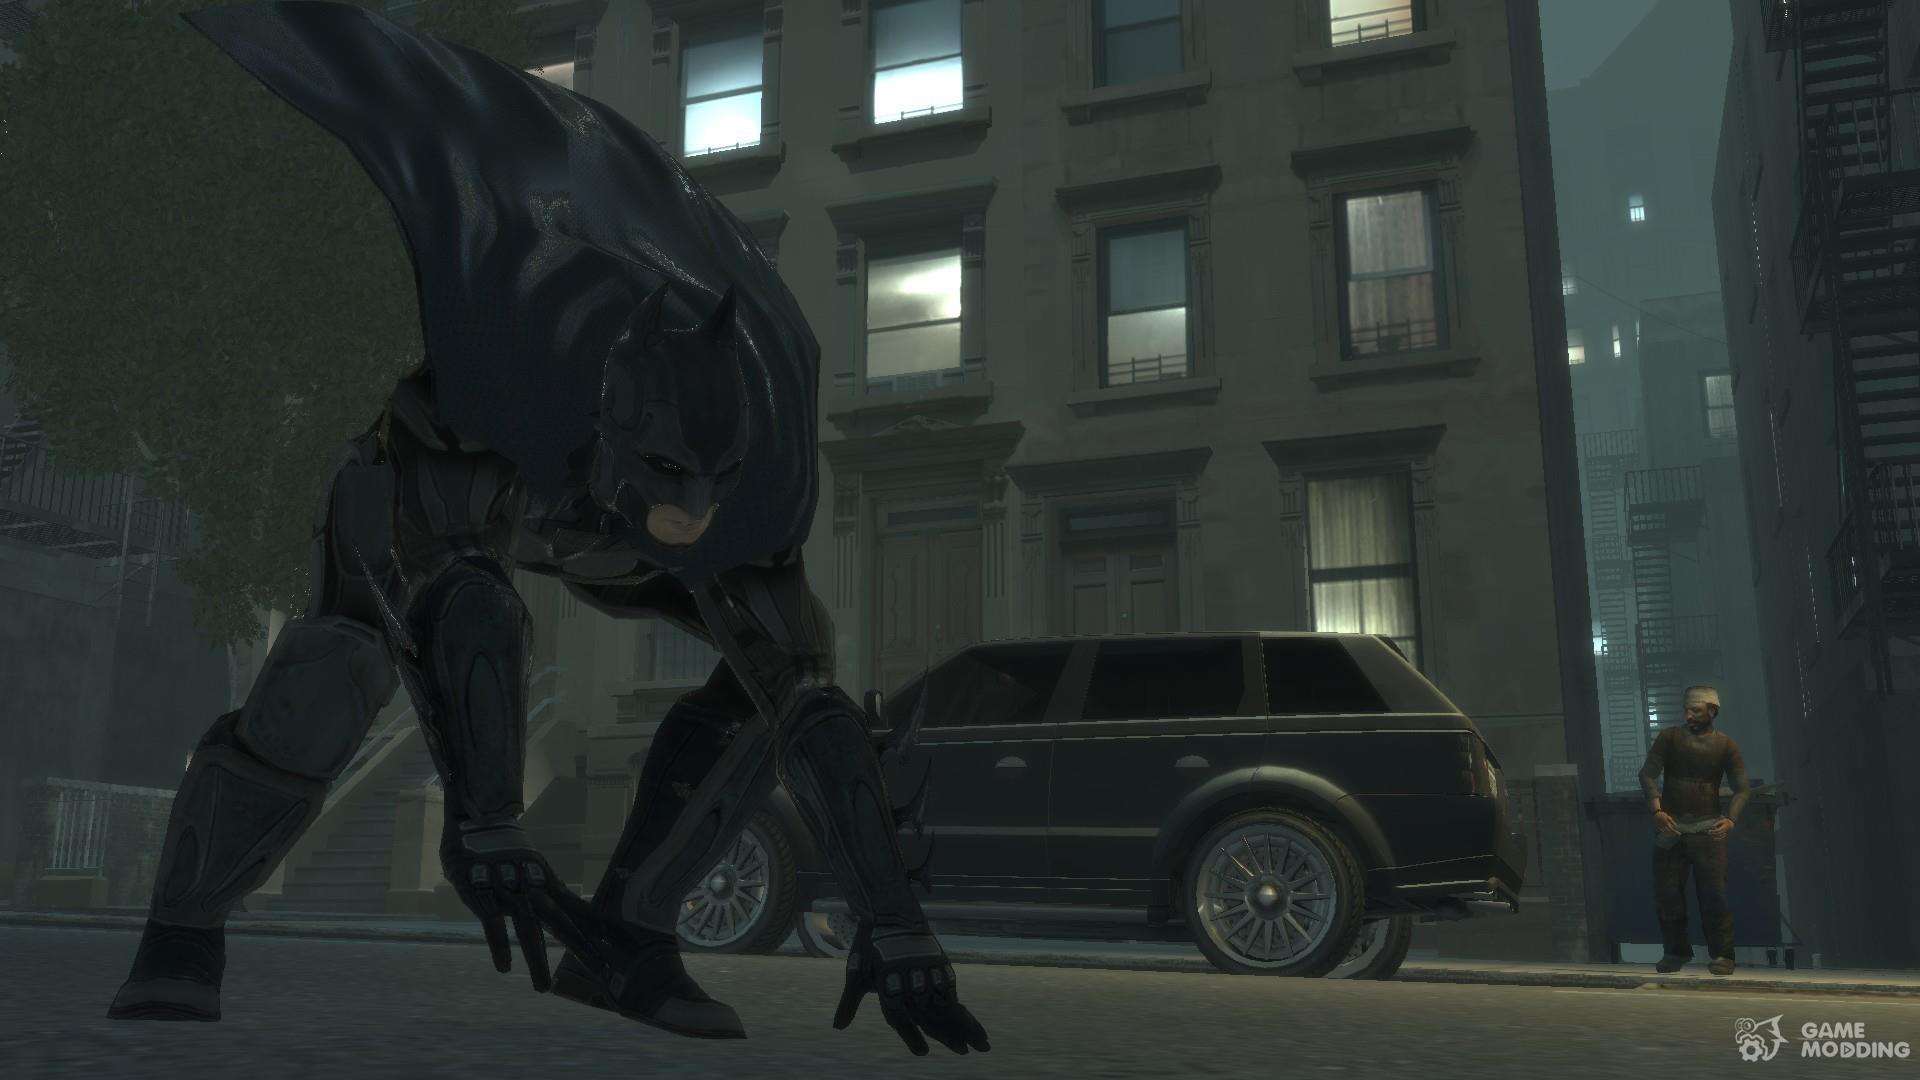 GTA 5,GTAV,GTA IV Mods and Skins: GTA 4 MOD : Batman